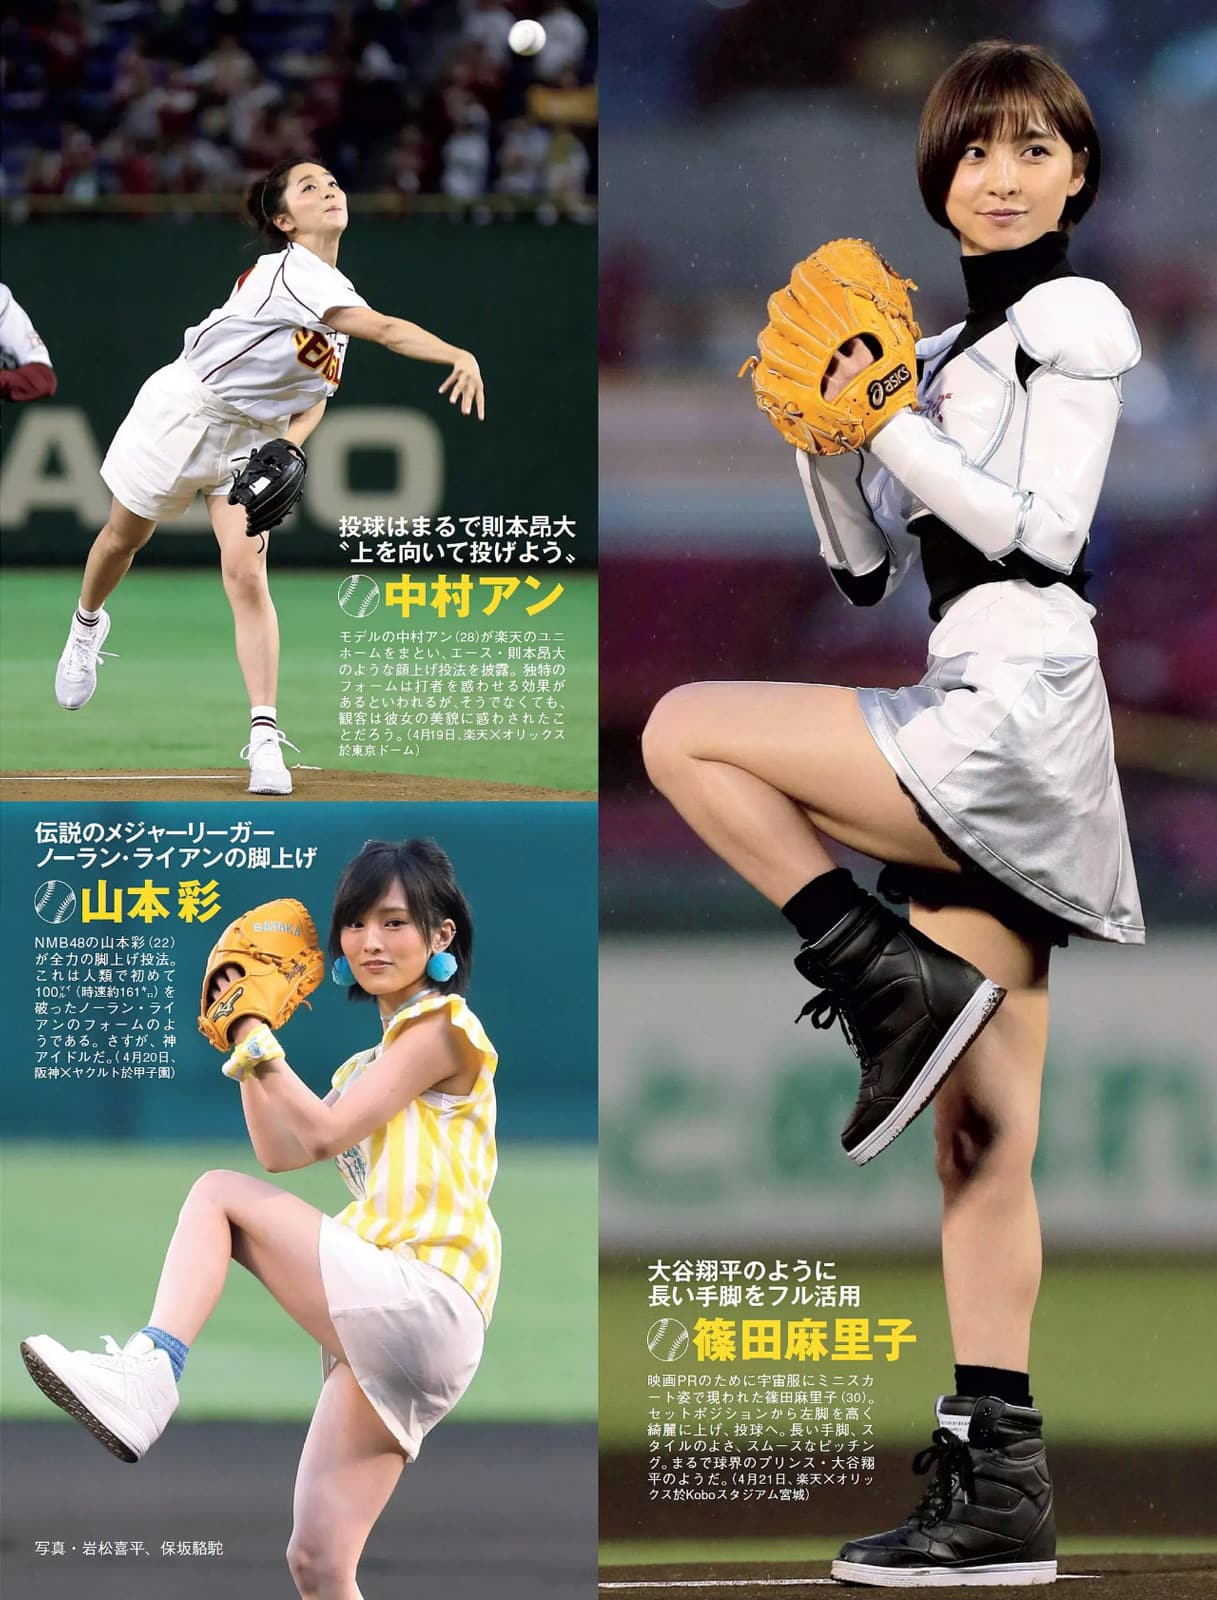 「FLASH (フラッシュ) 2016年 5/24 号」始球式で投げる篠田麻里子、中村アン、山本彩